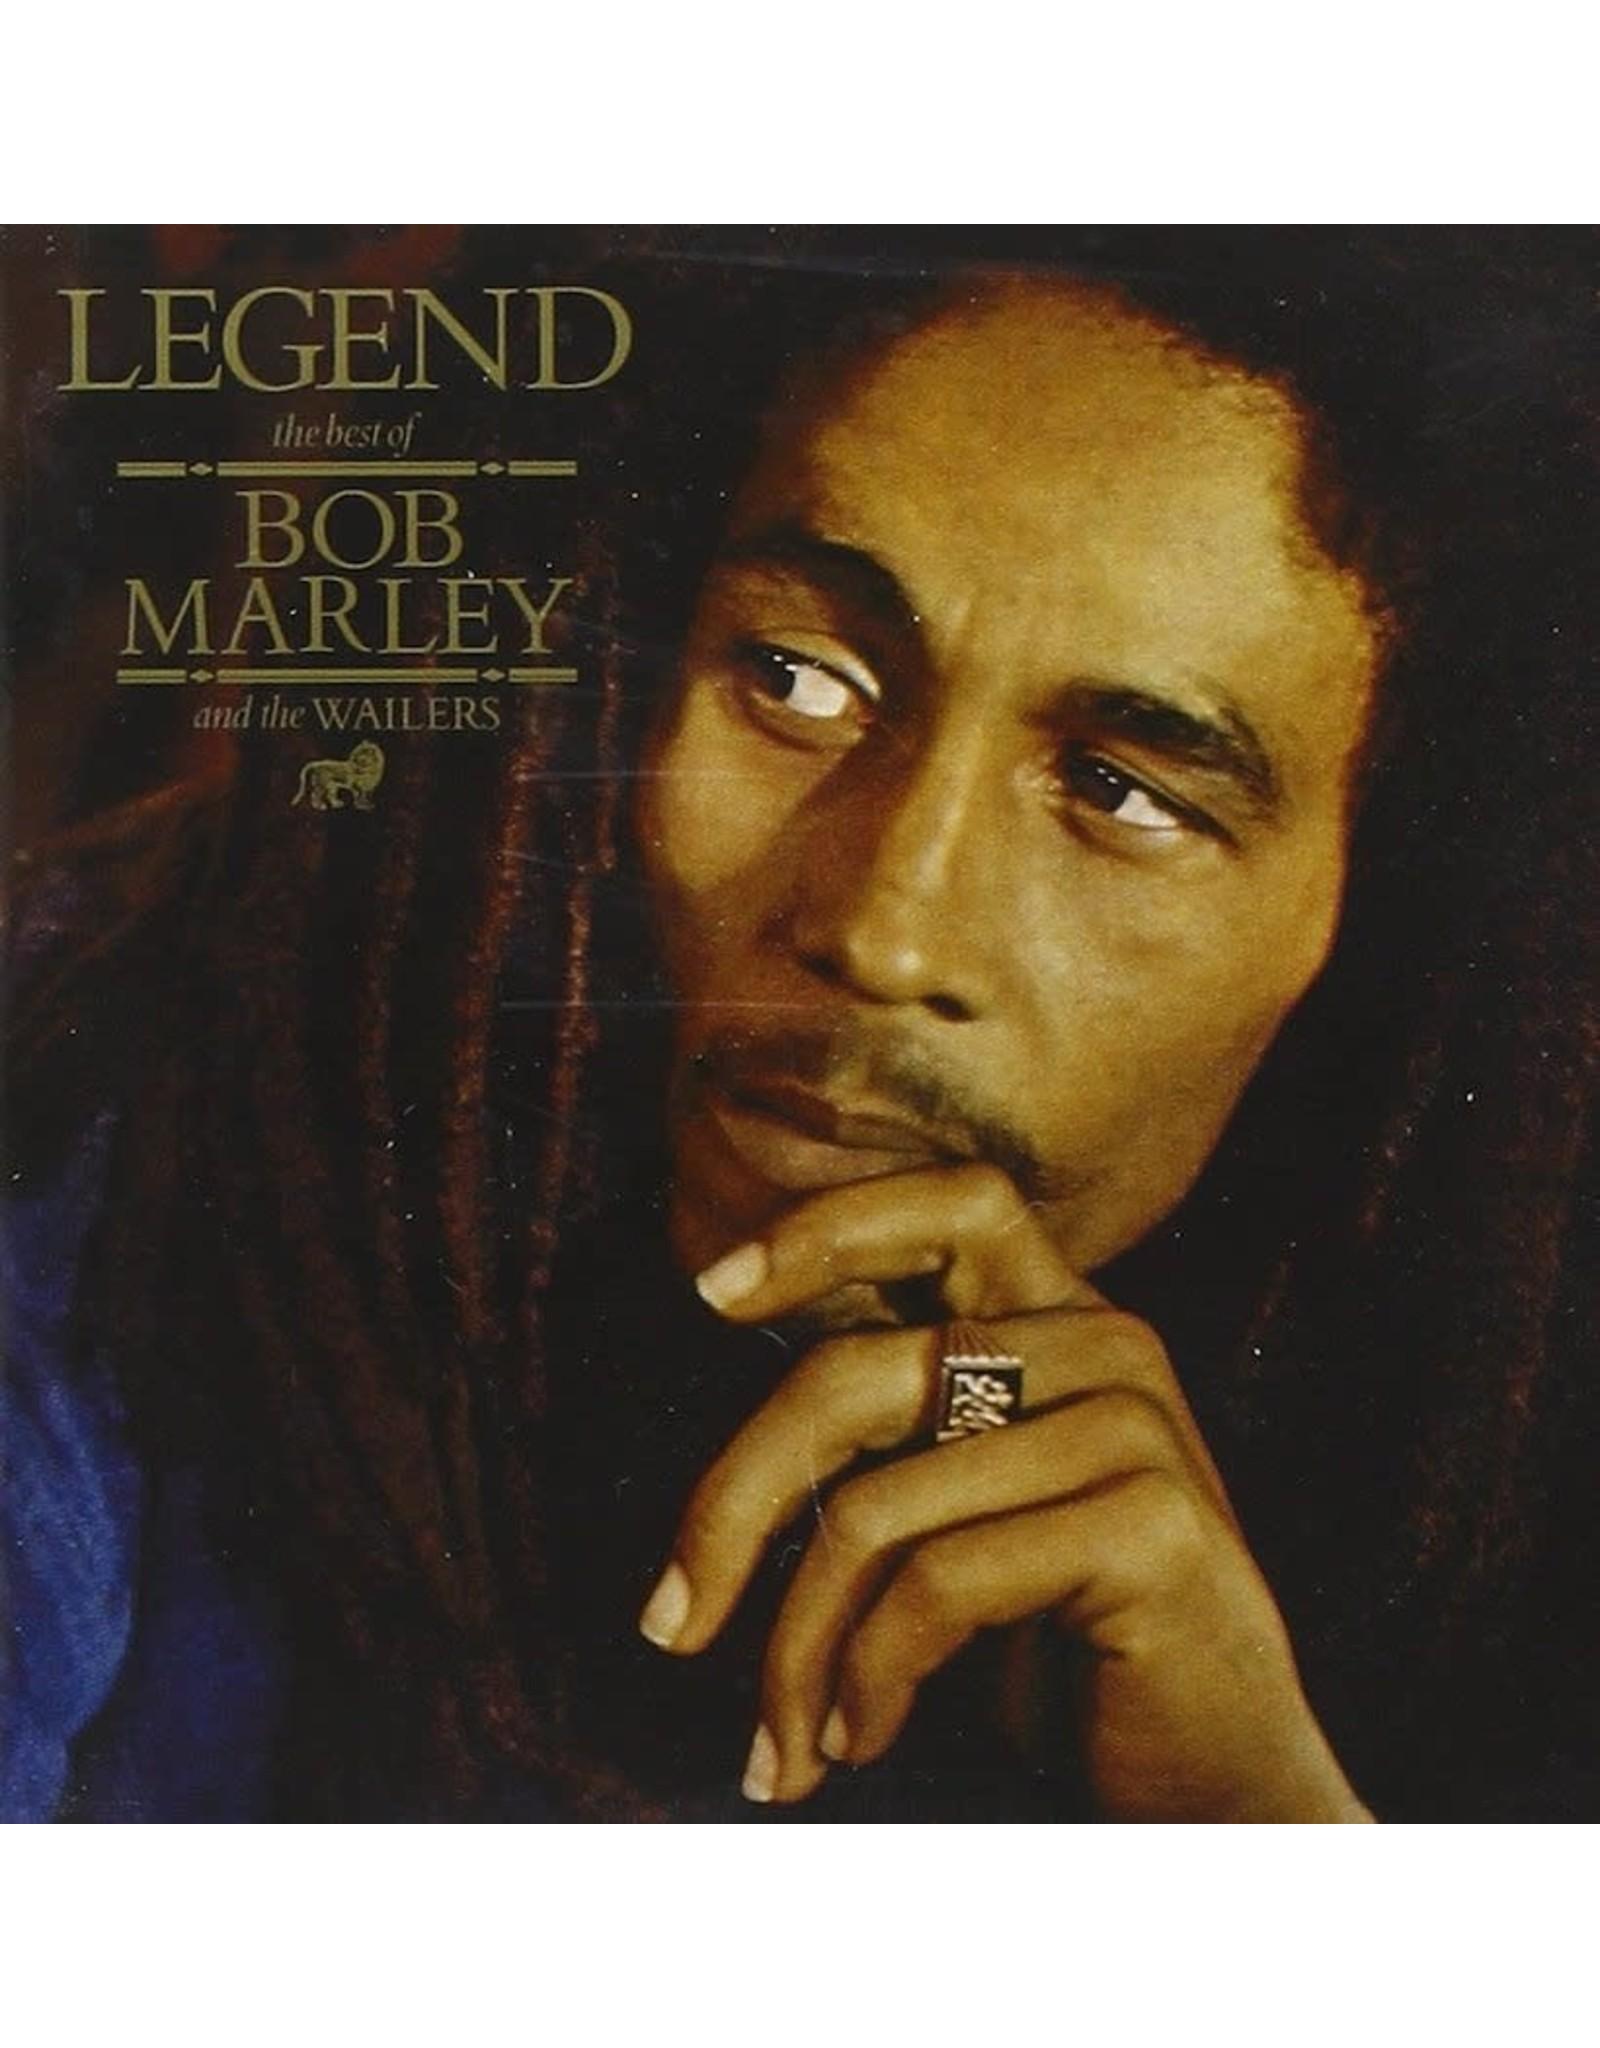 Bob Marley & The Wailers - Legend (Best Of)